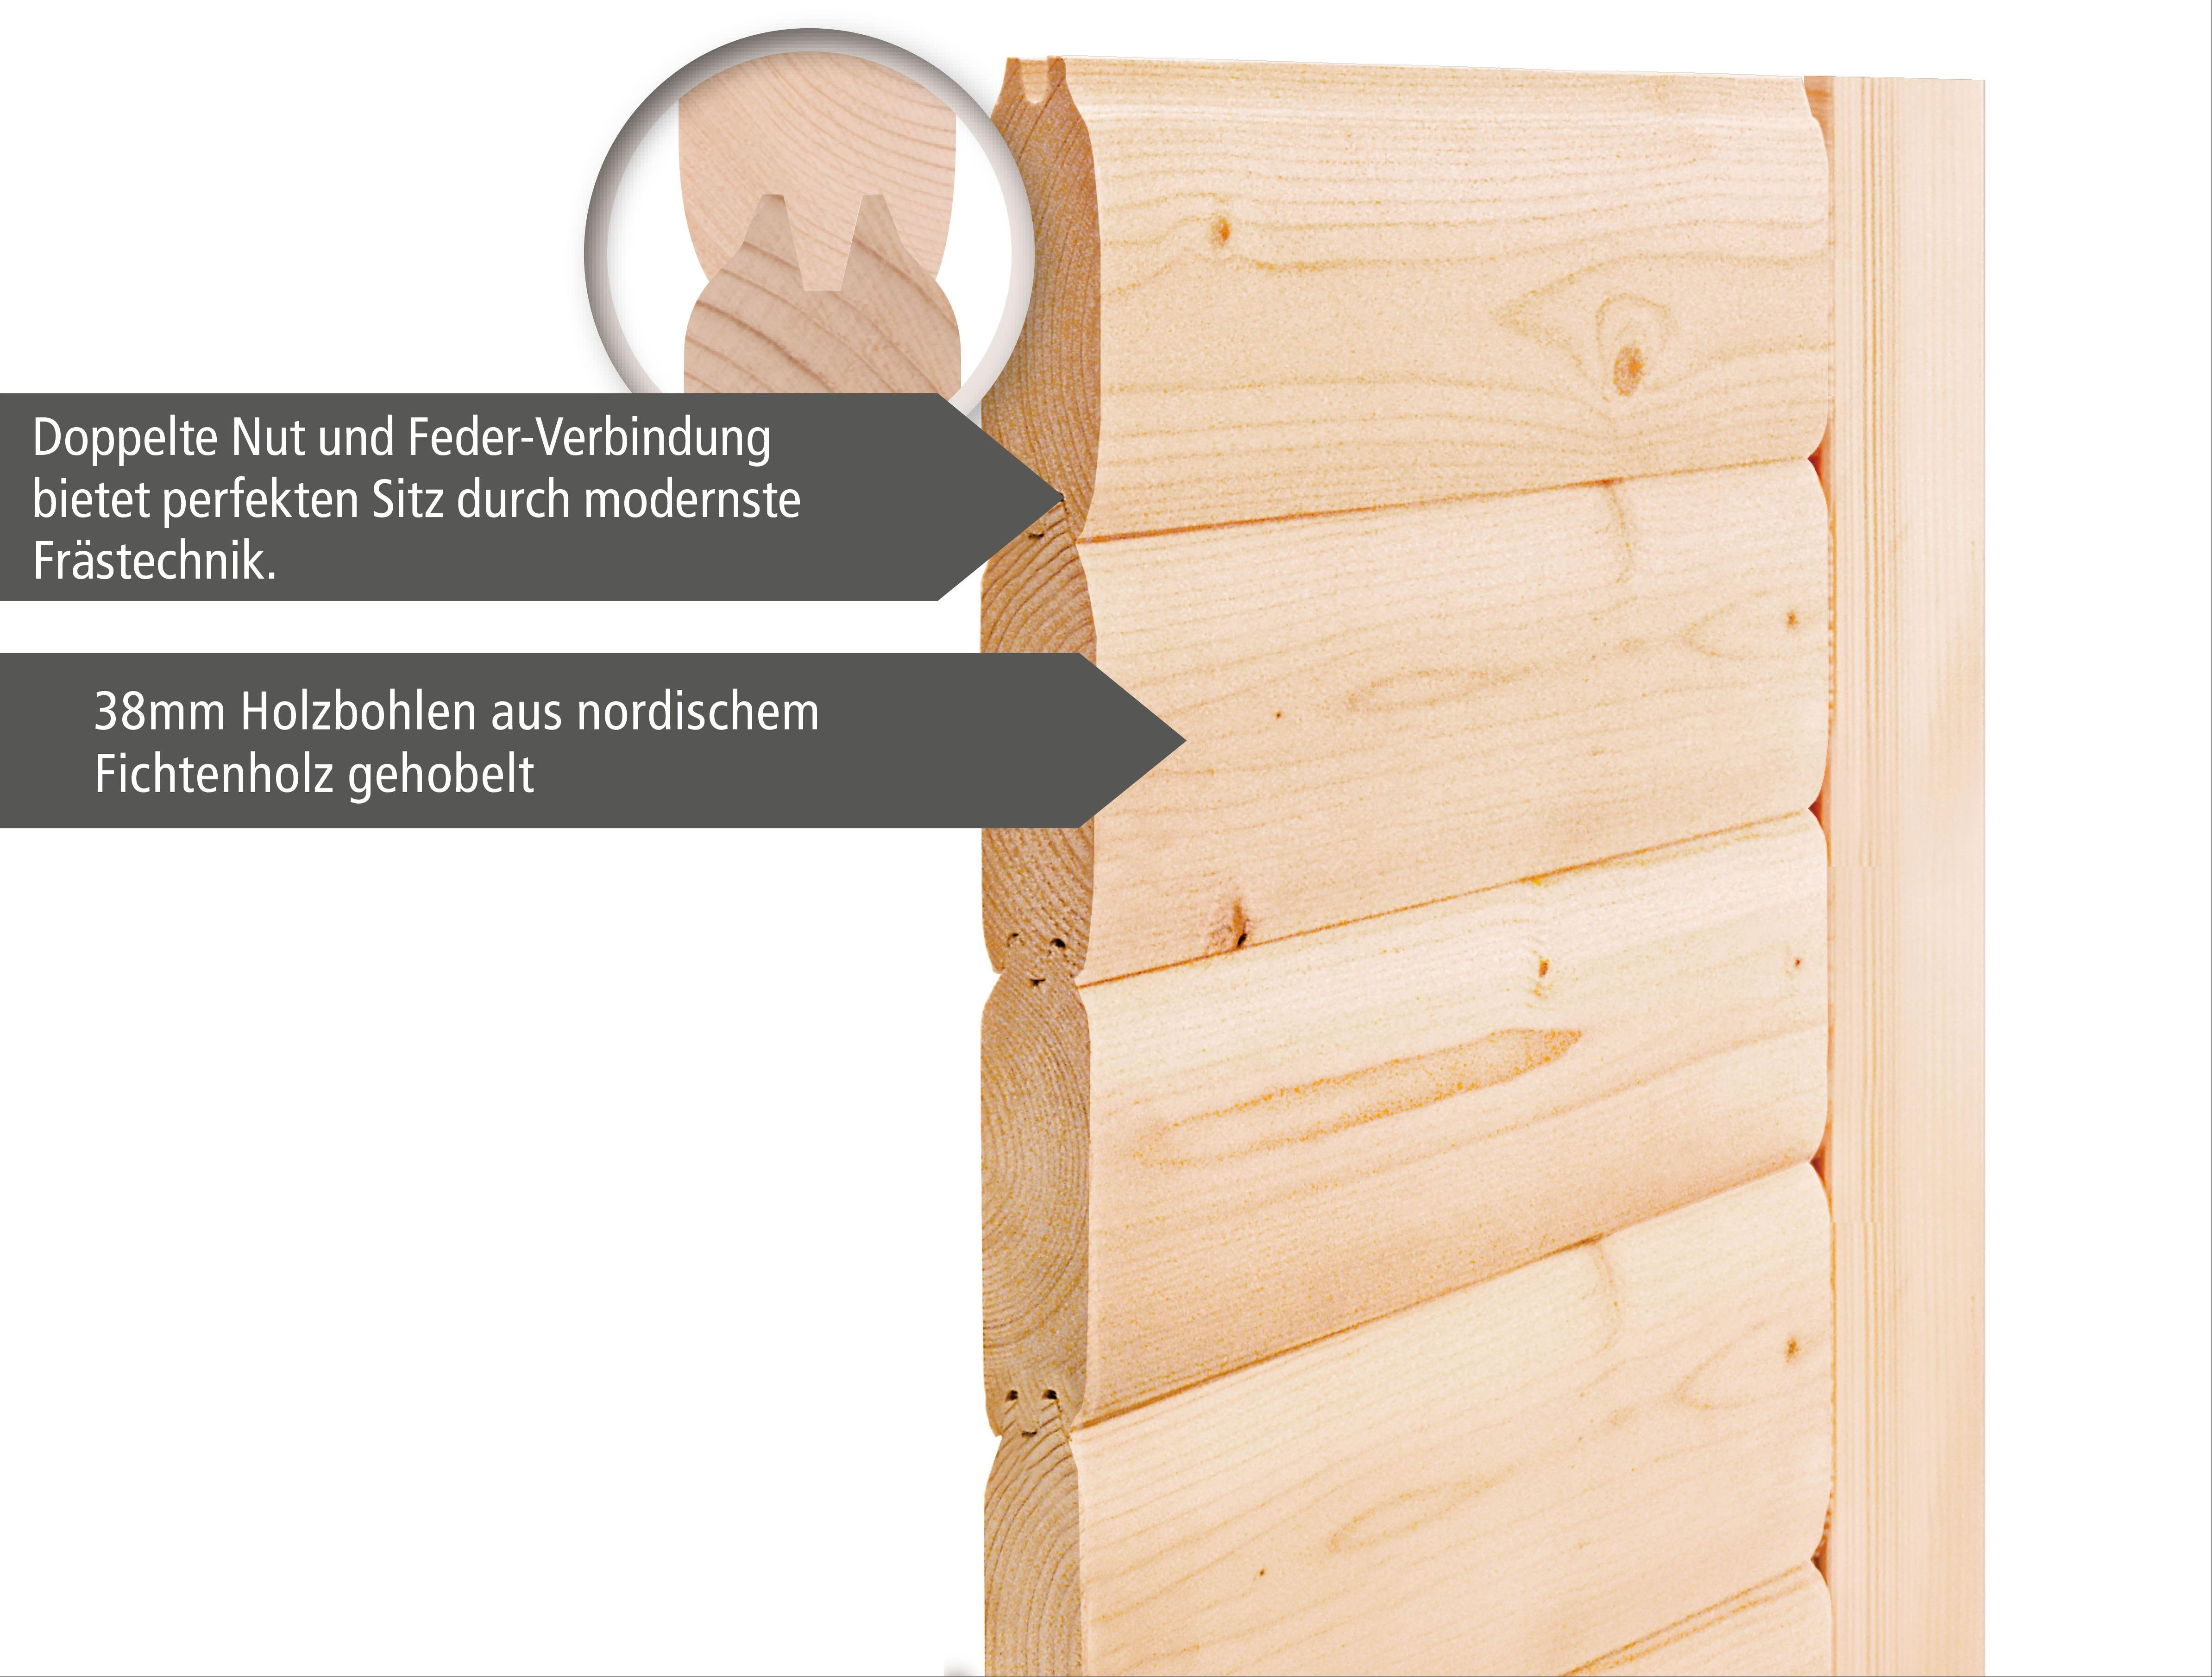 WoodFeeling Sauna Mia 38mm Saunaofen 9kW intern moderne Tür Bild 5